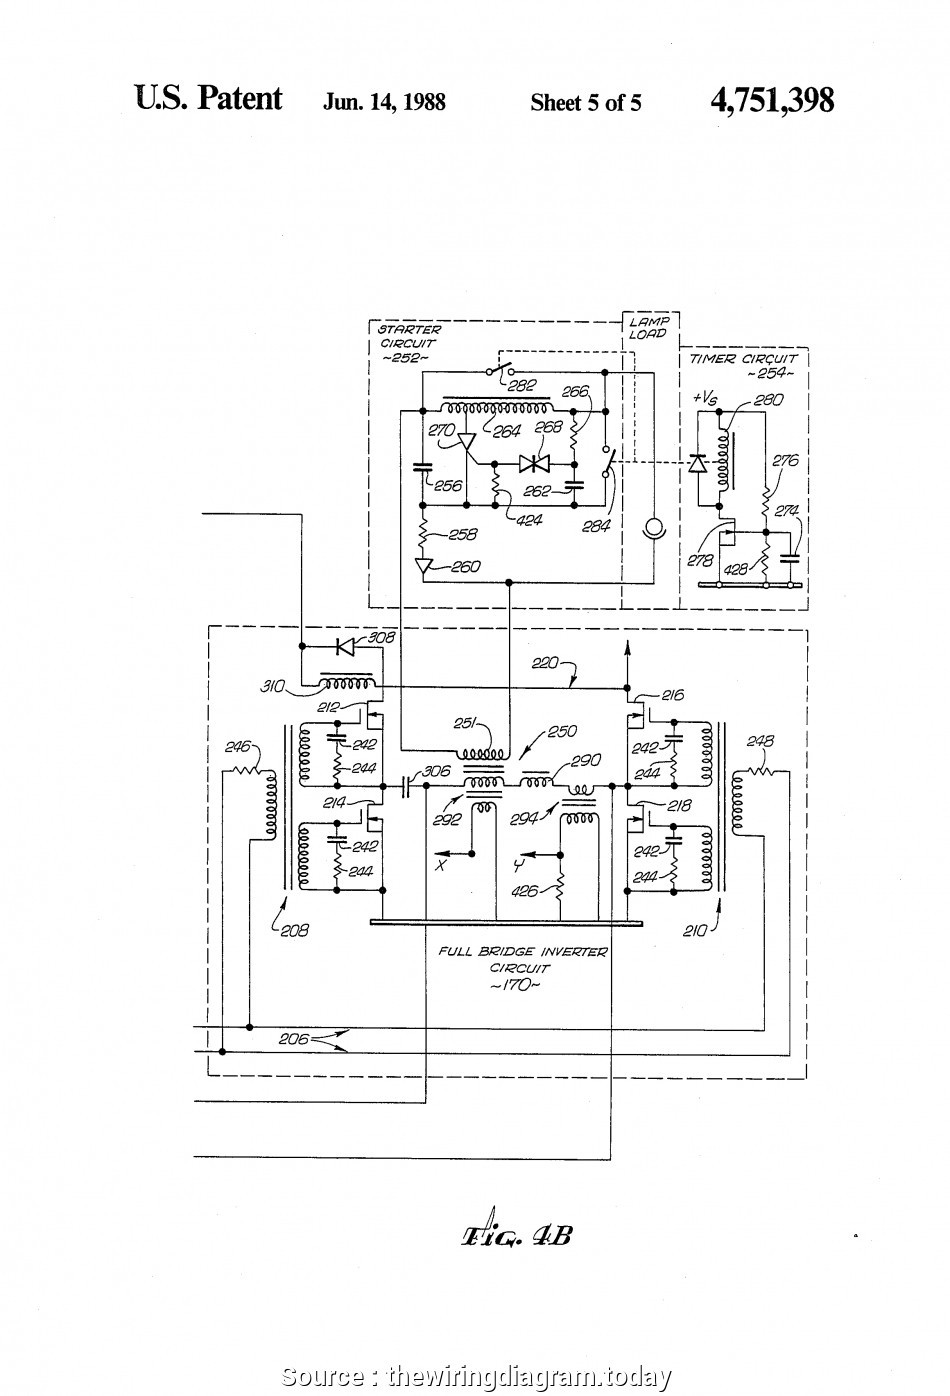 Bodine Ballast Wiring Diagram Lp 400 - Chinese 125cc Four Wheeler Wiring  Diagram for Wiring Diagram SchematicsWiring Diagram Schematics